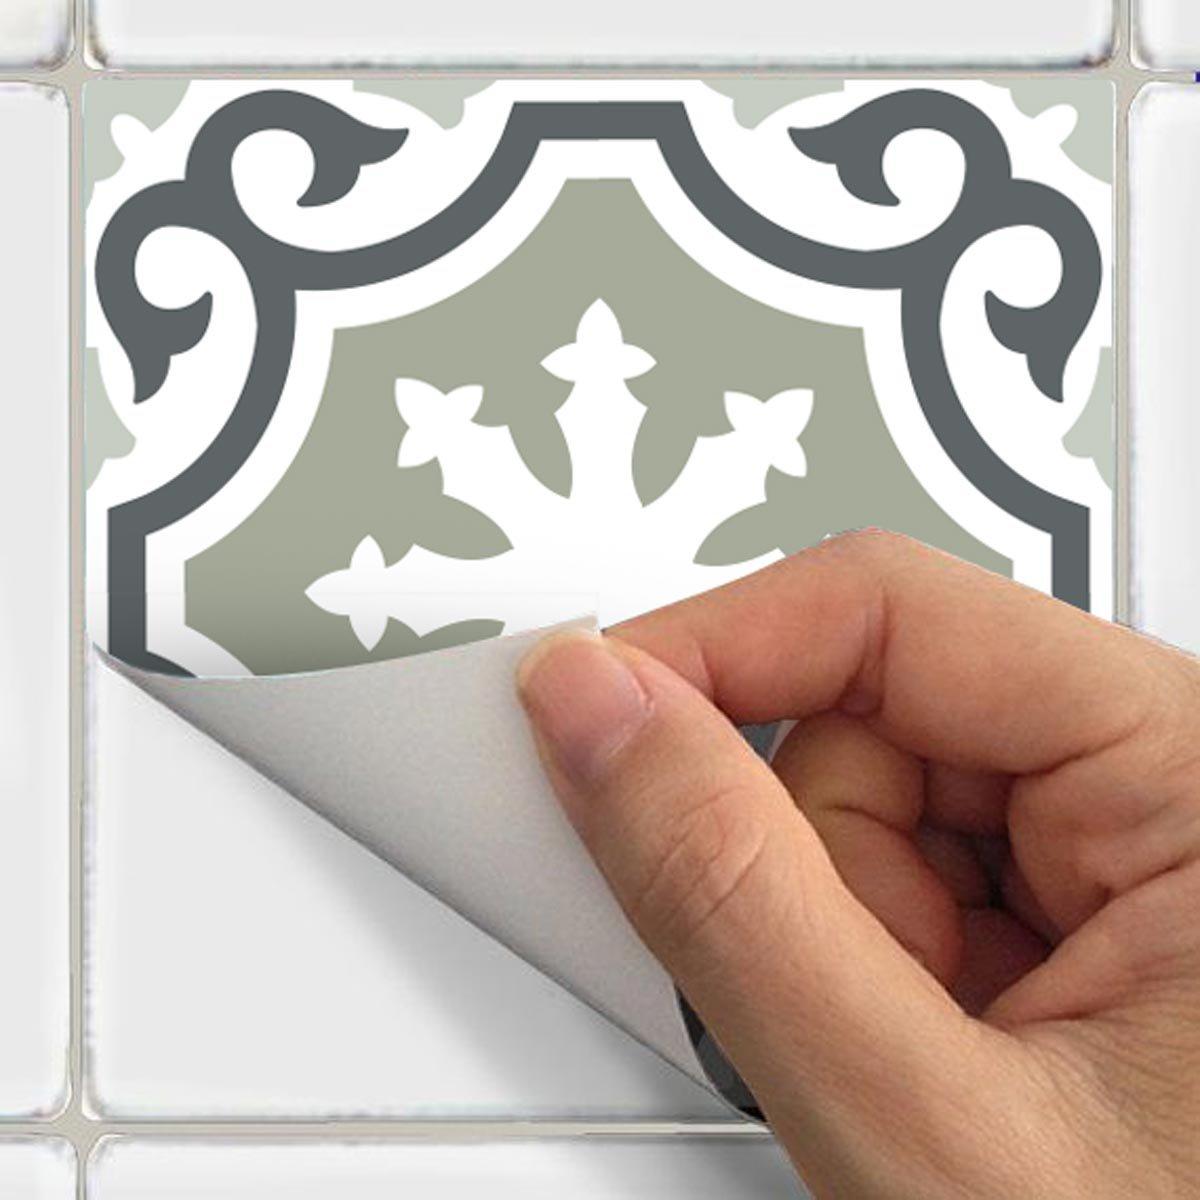 20 x 20 cm 30 pi/èces Stickers adh/ésifs carrelages muraux azulejos